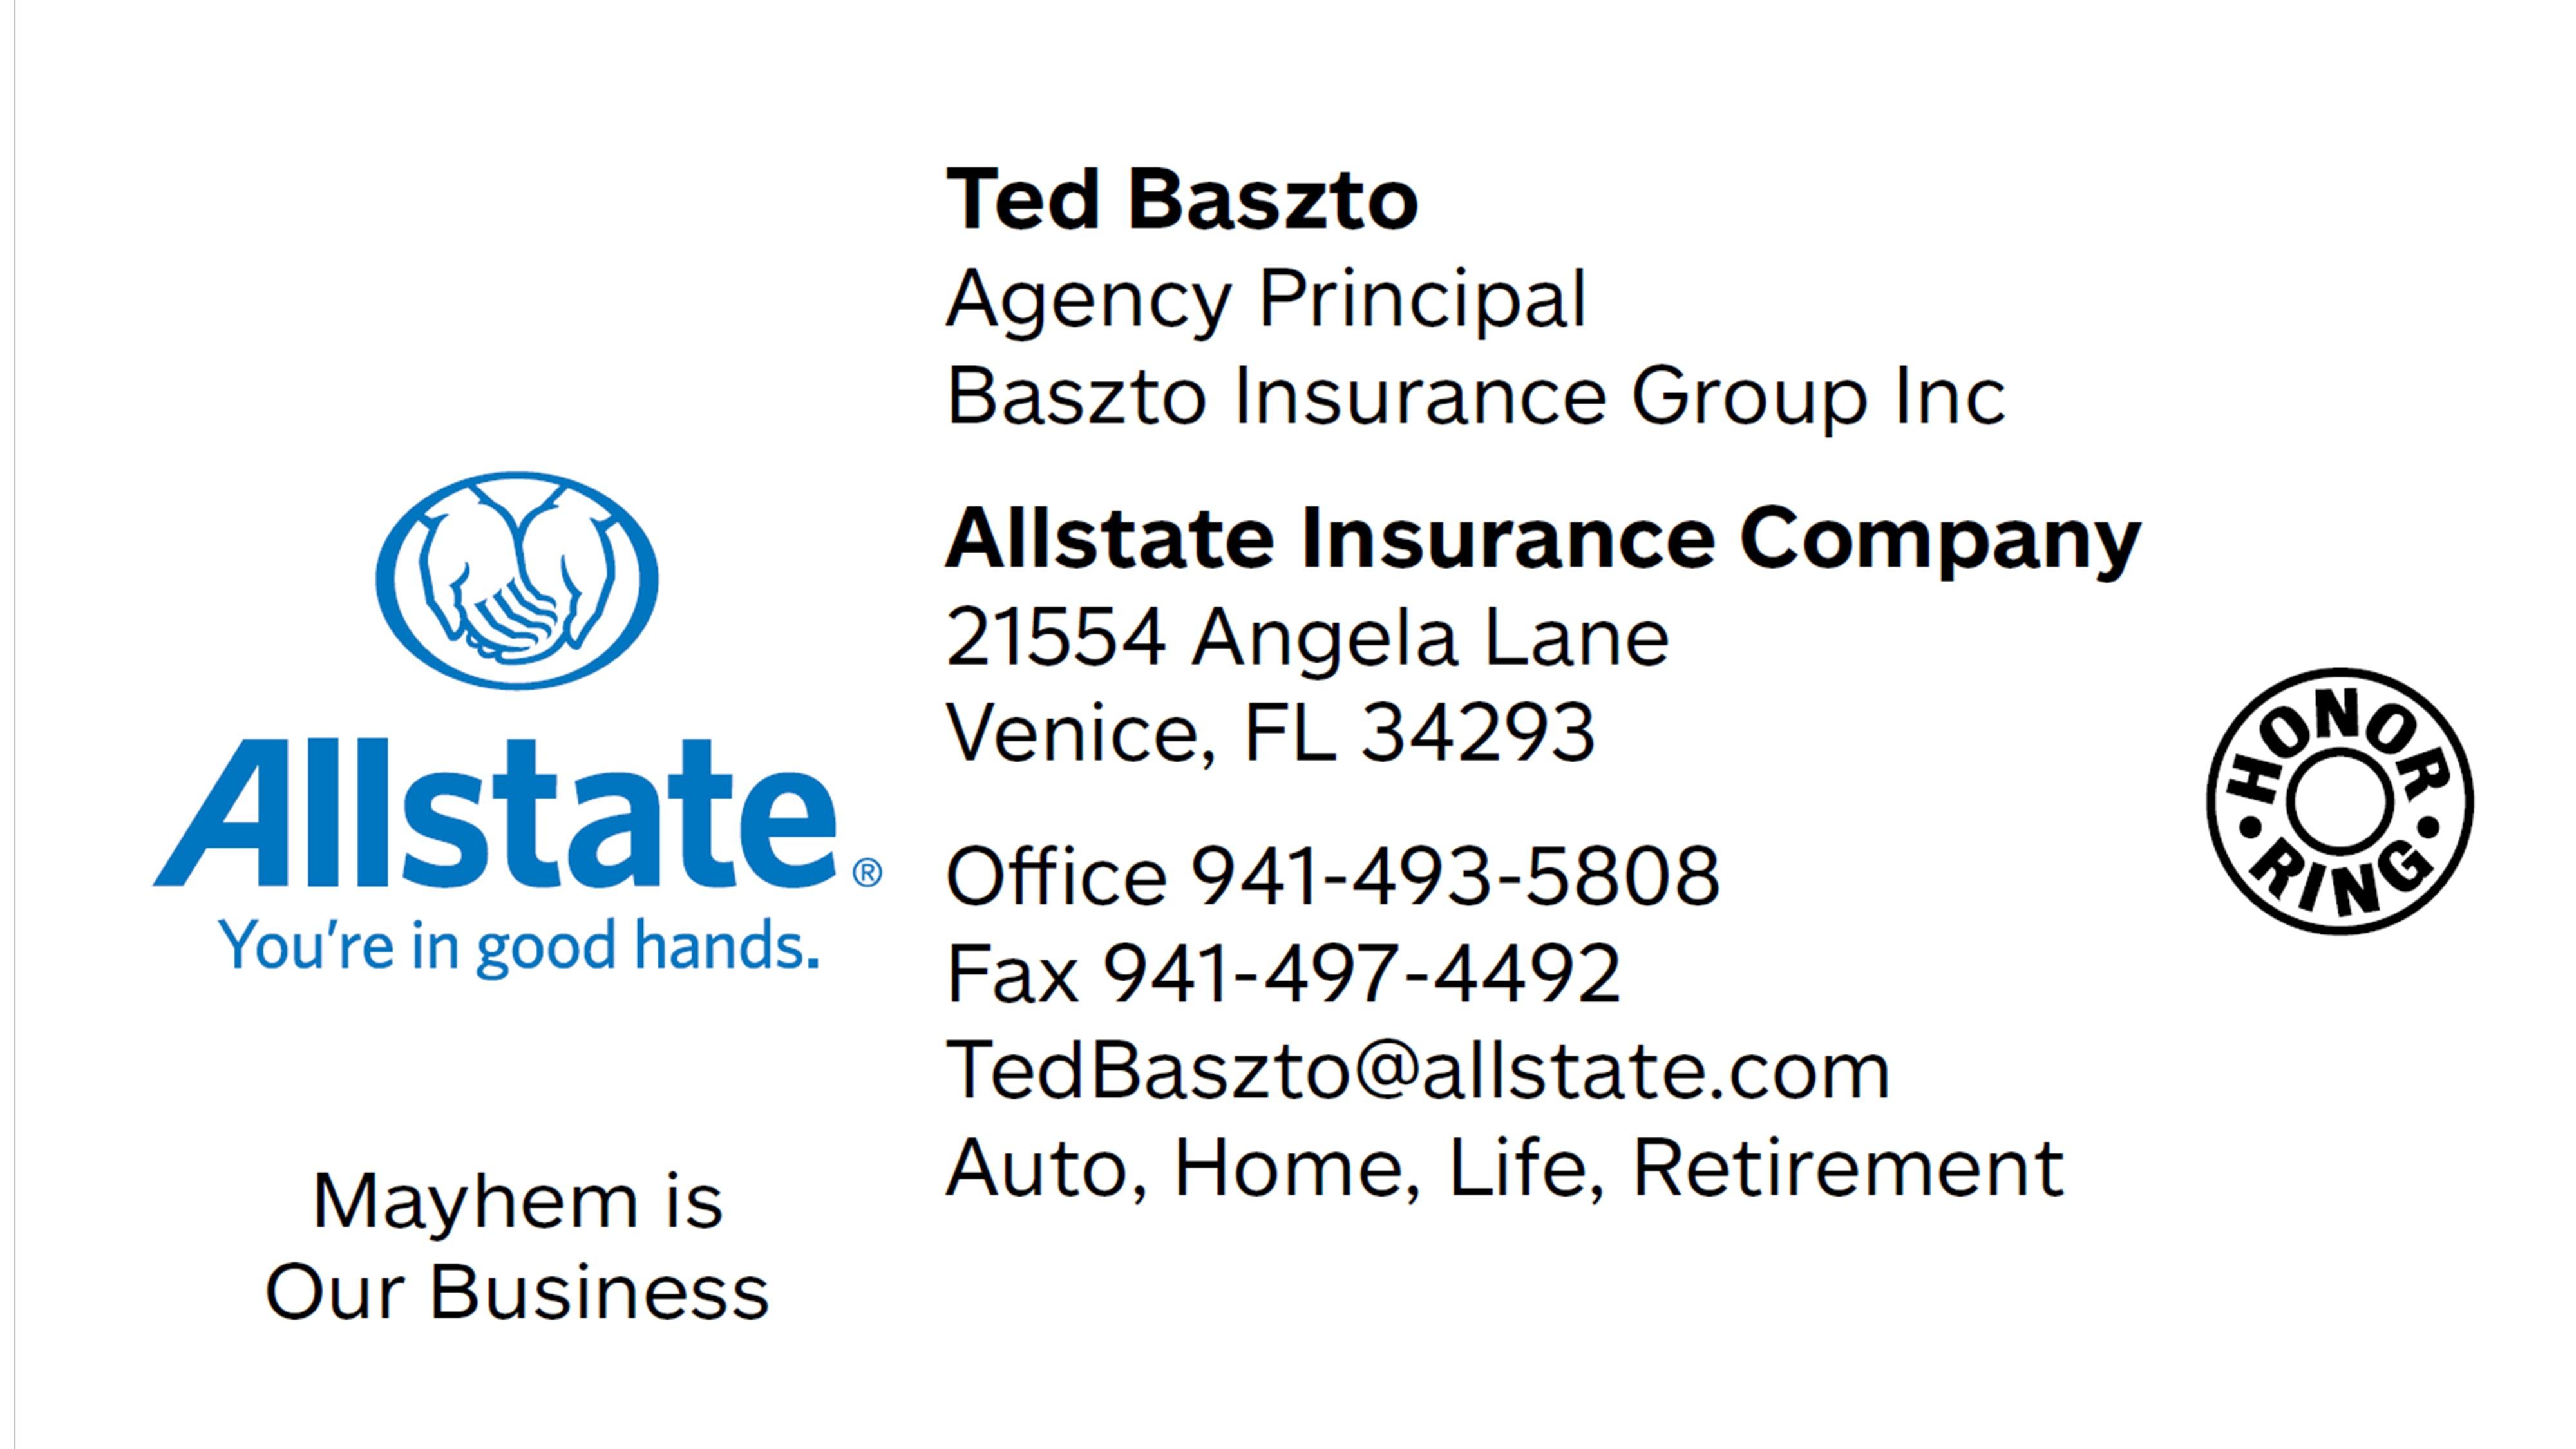 Ted Baszto Allstate